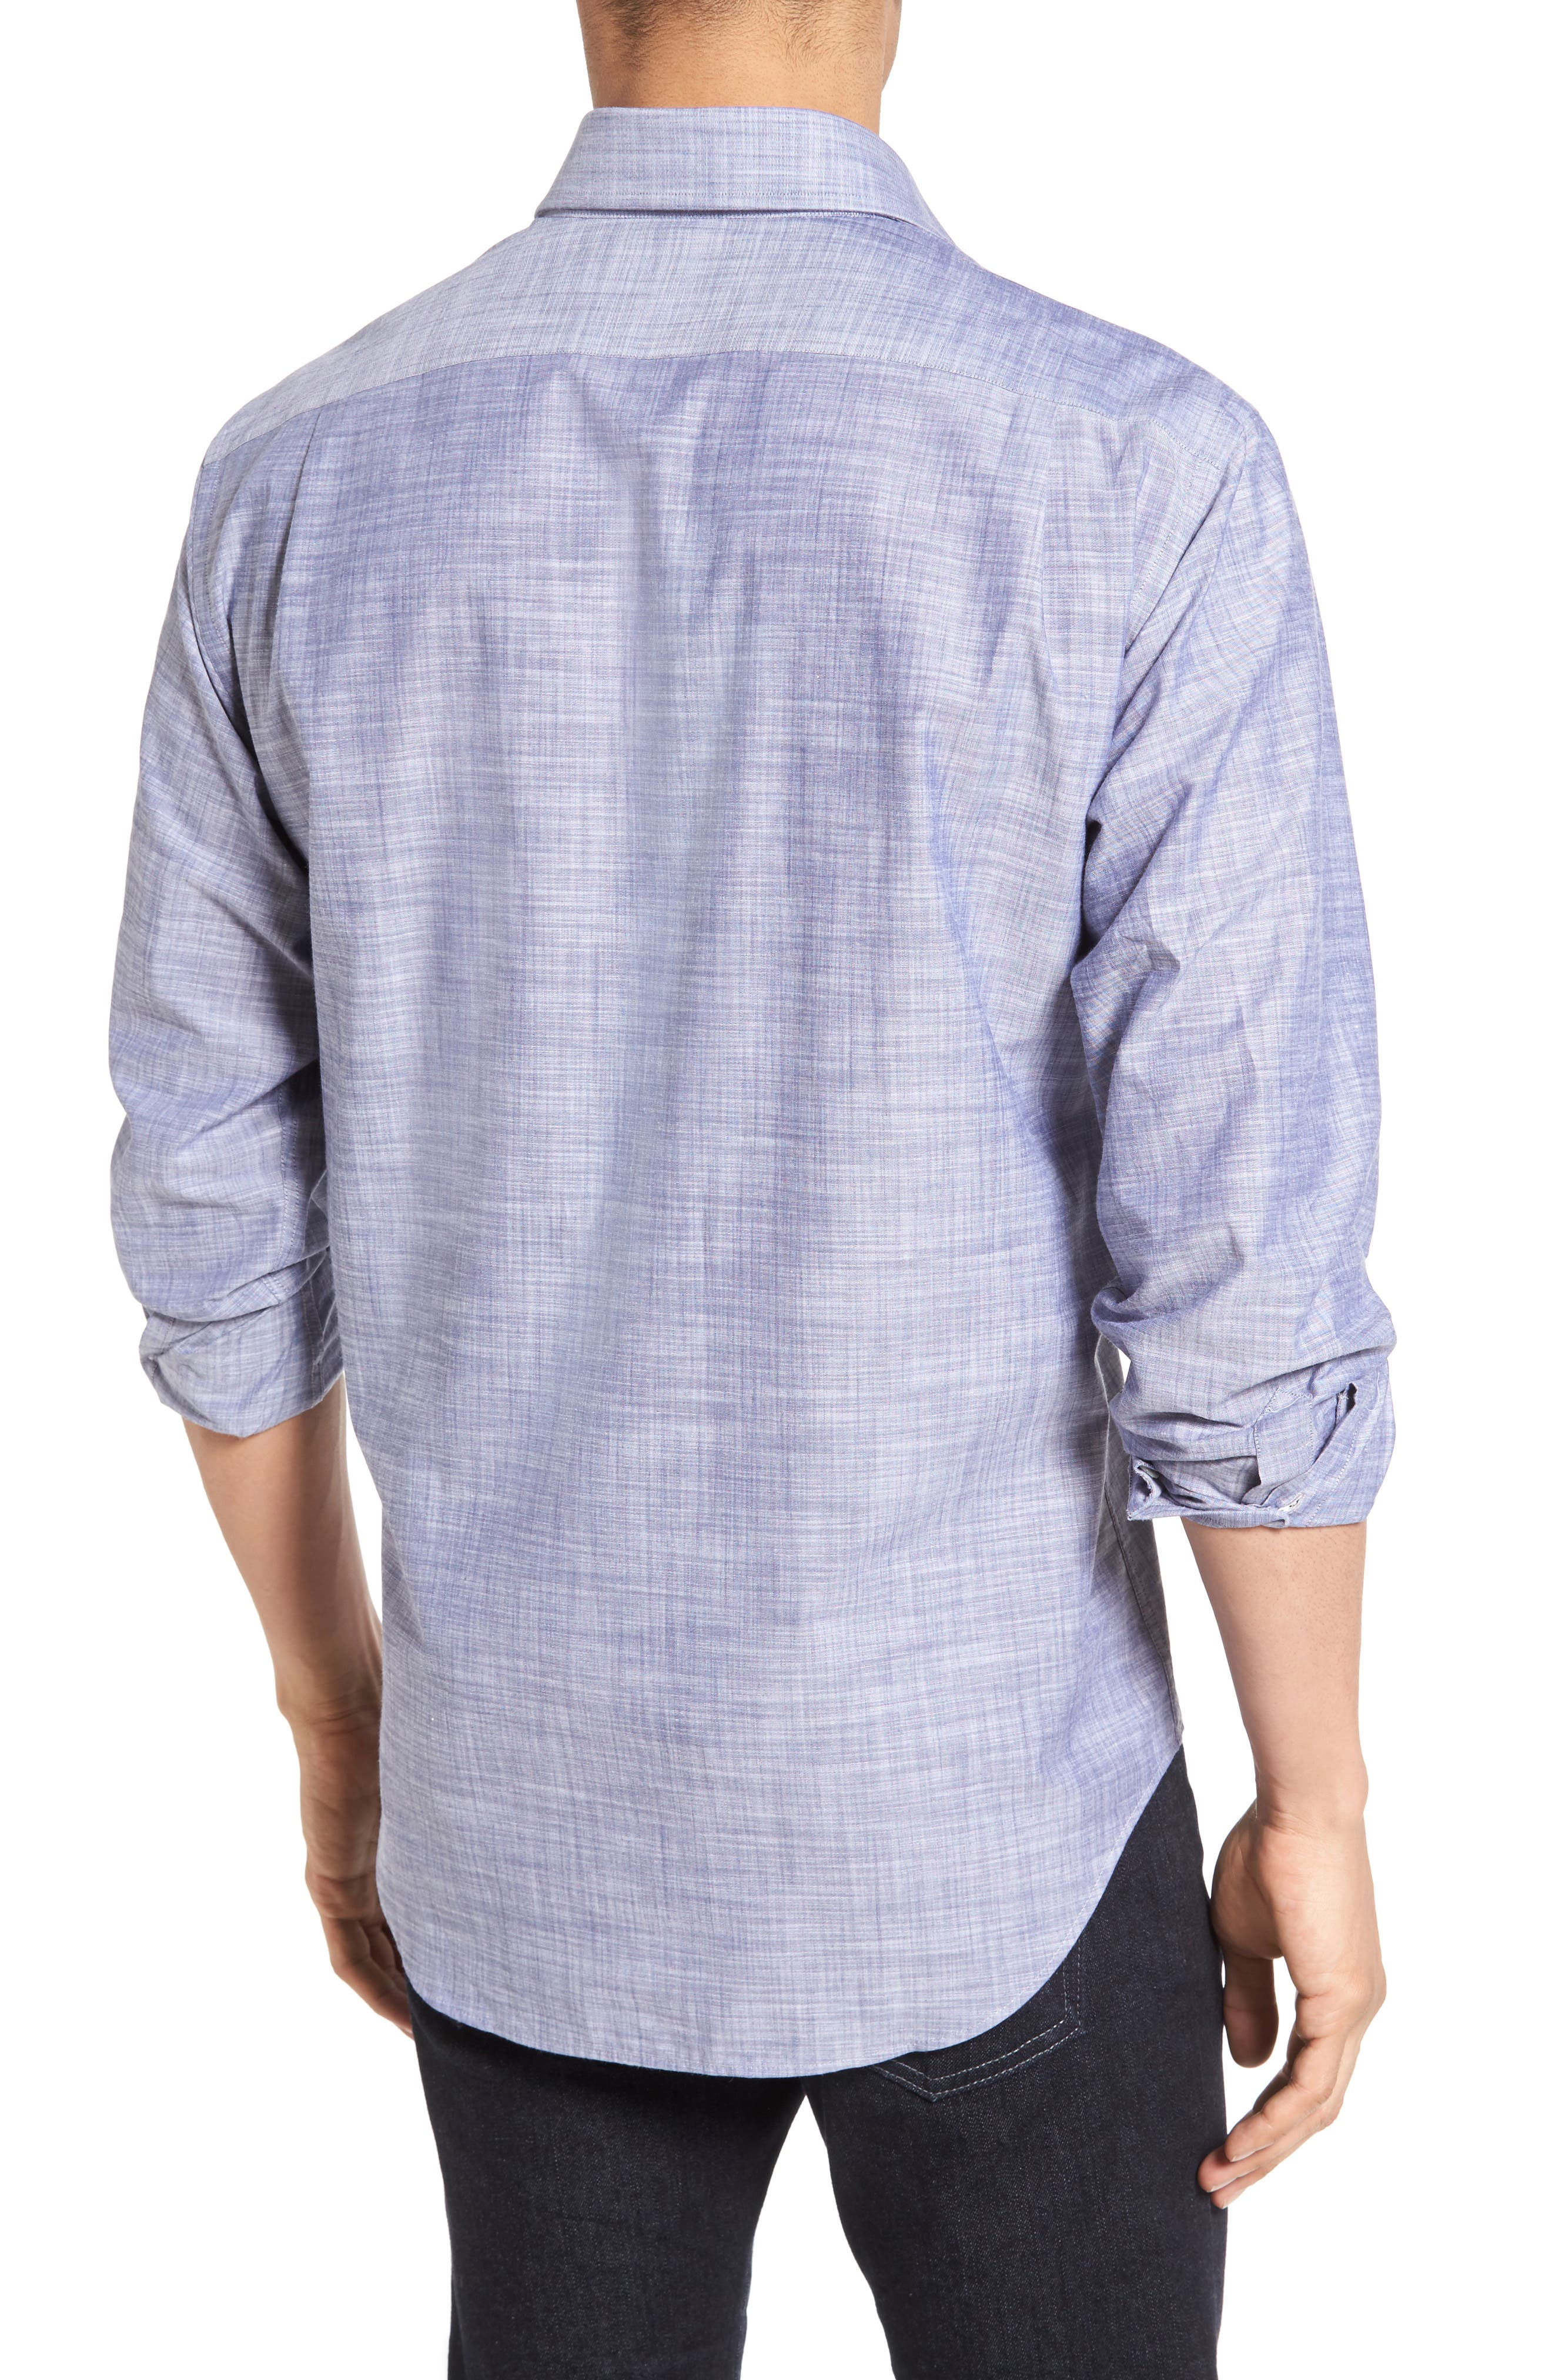 Alternate Image 2  - Ledbury The McDaniel Classic Fit Chambray Sport Shirt